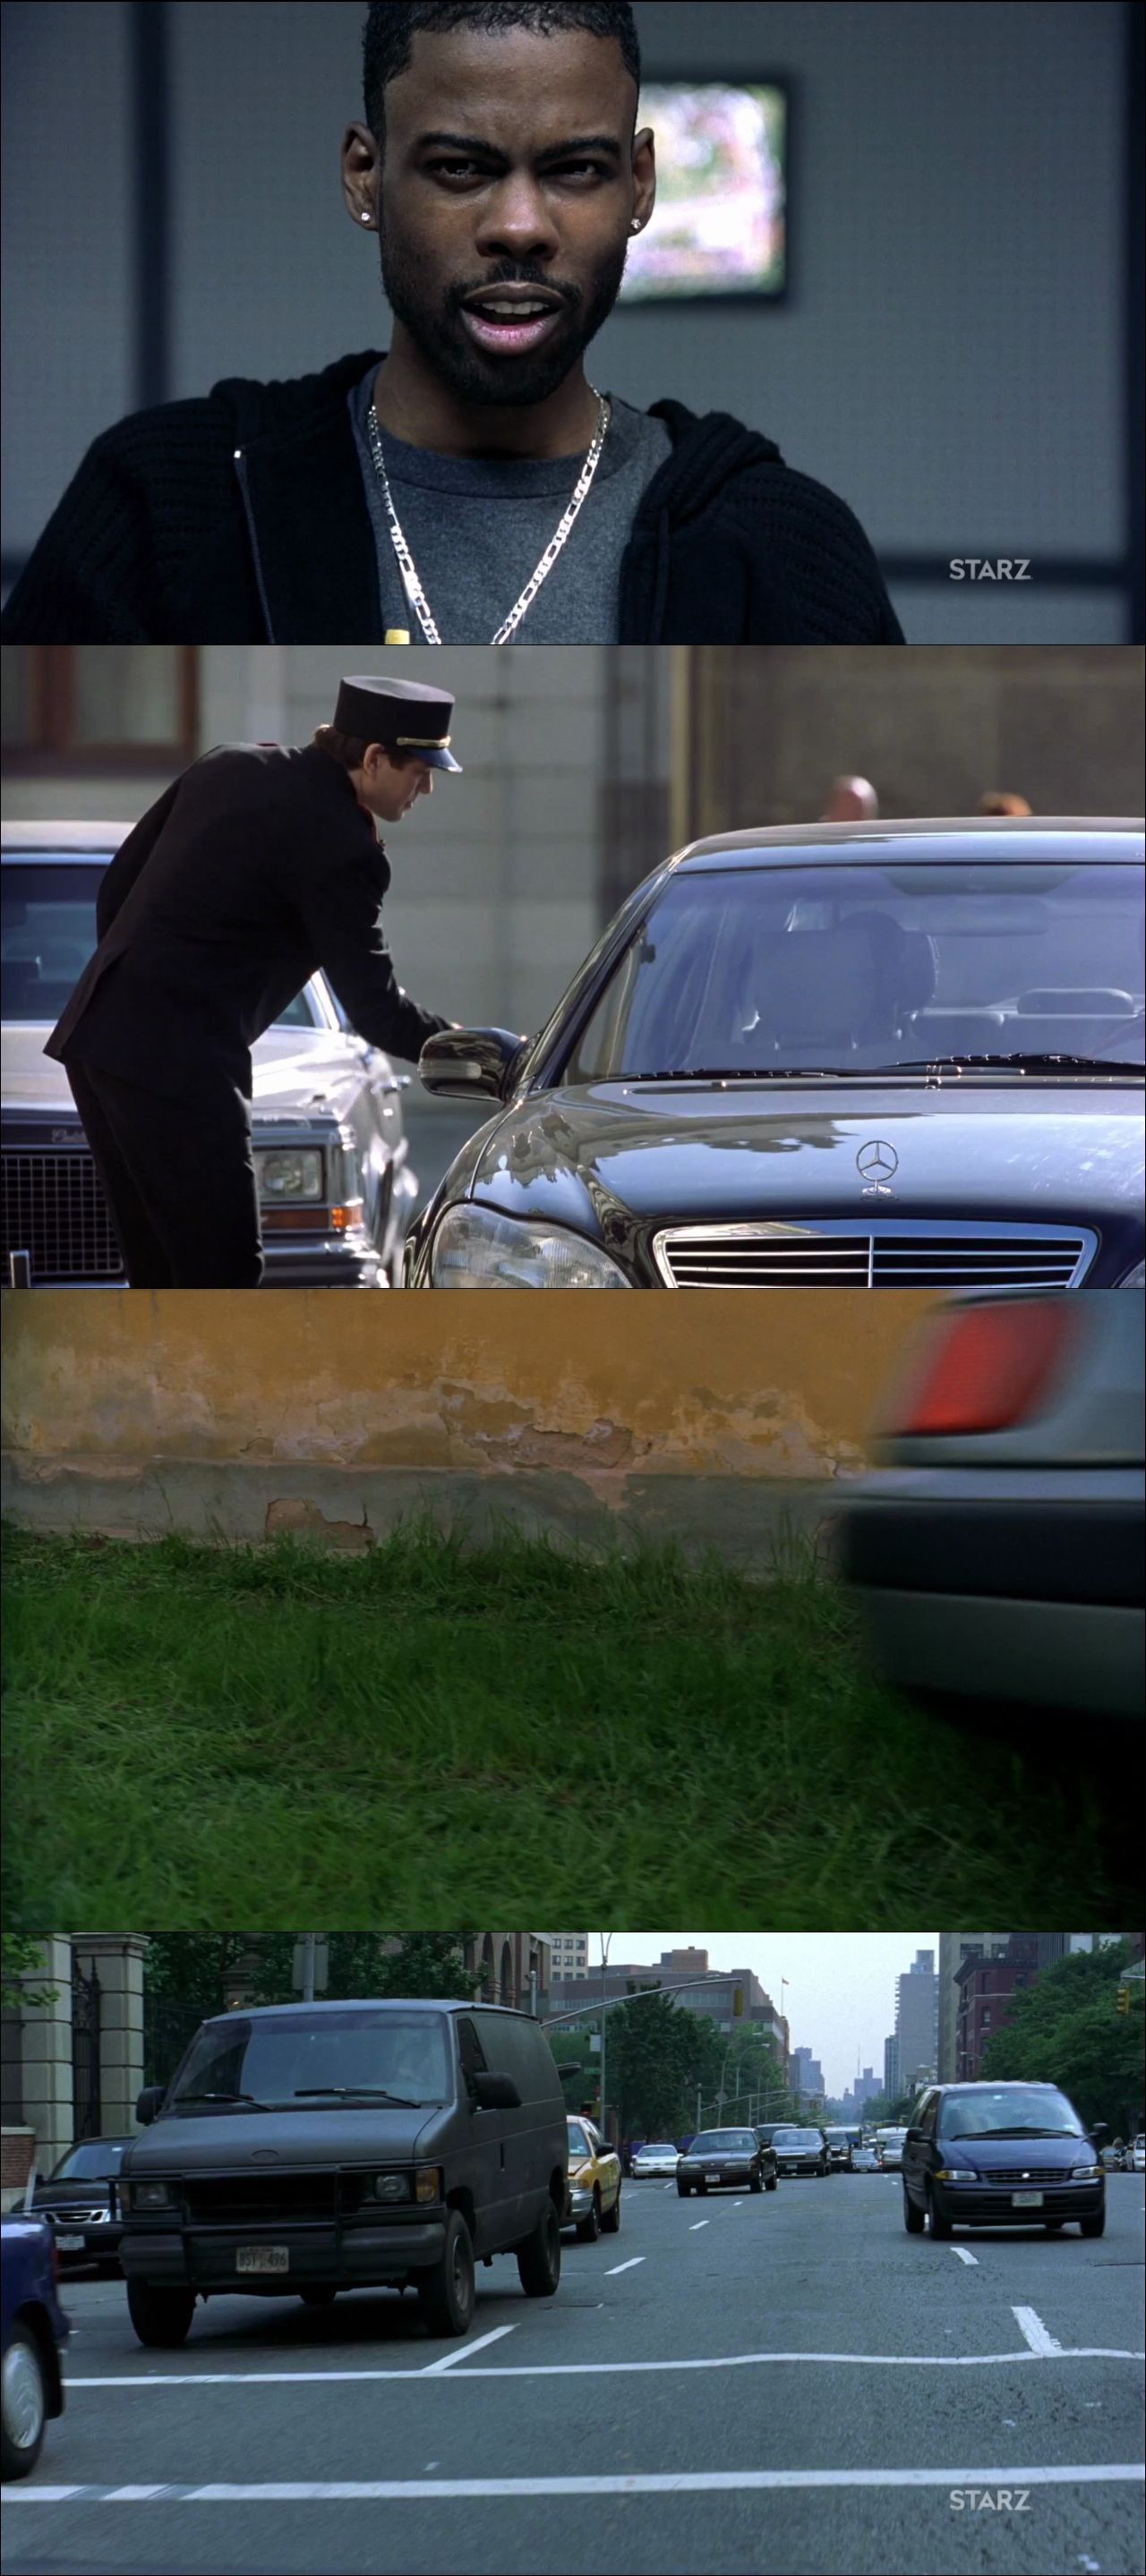 Gizli Ortak - Bad Company (2002) hd türkçe dublaj film indir